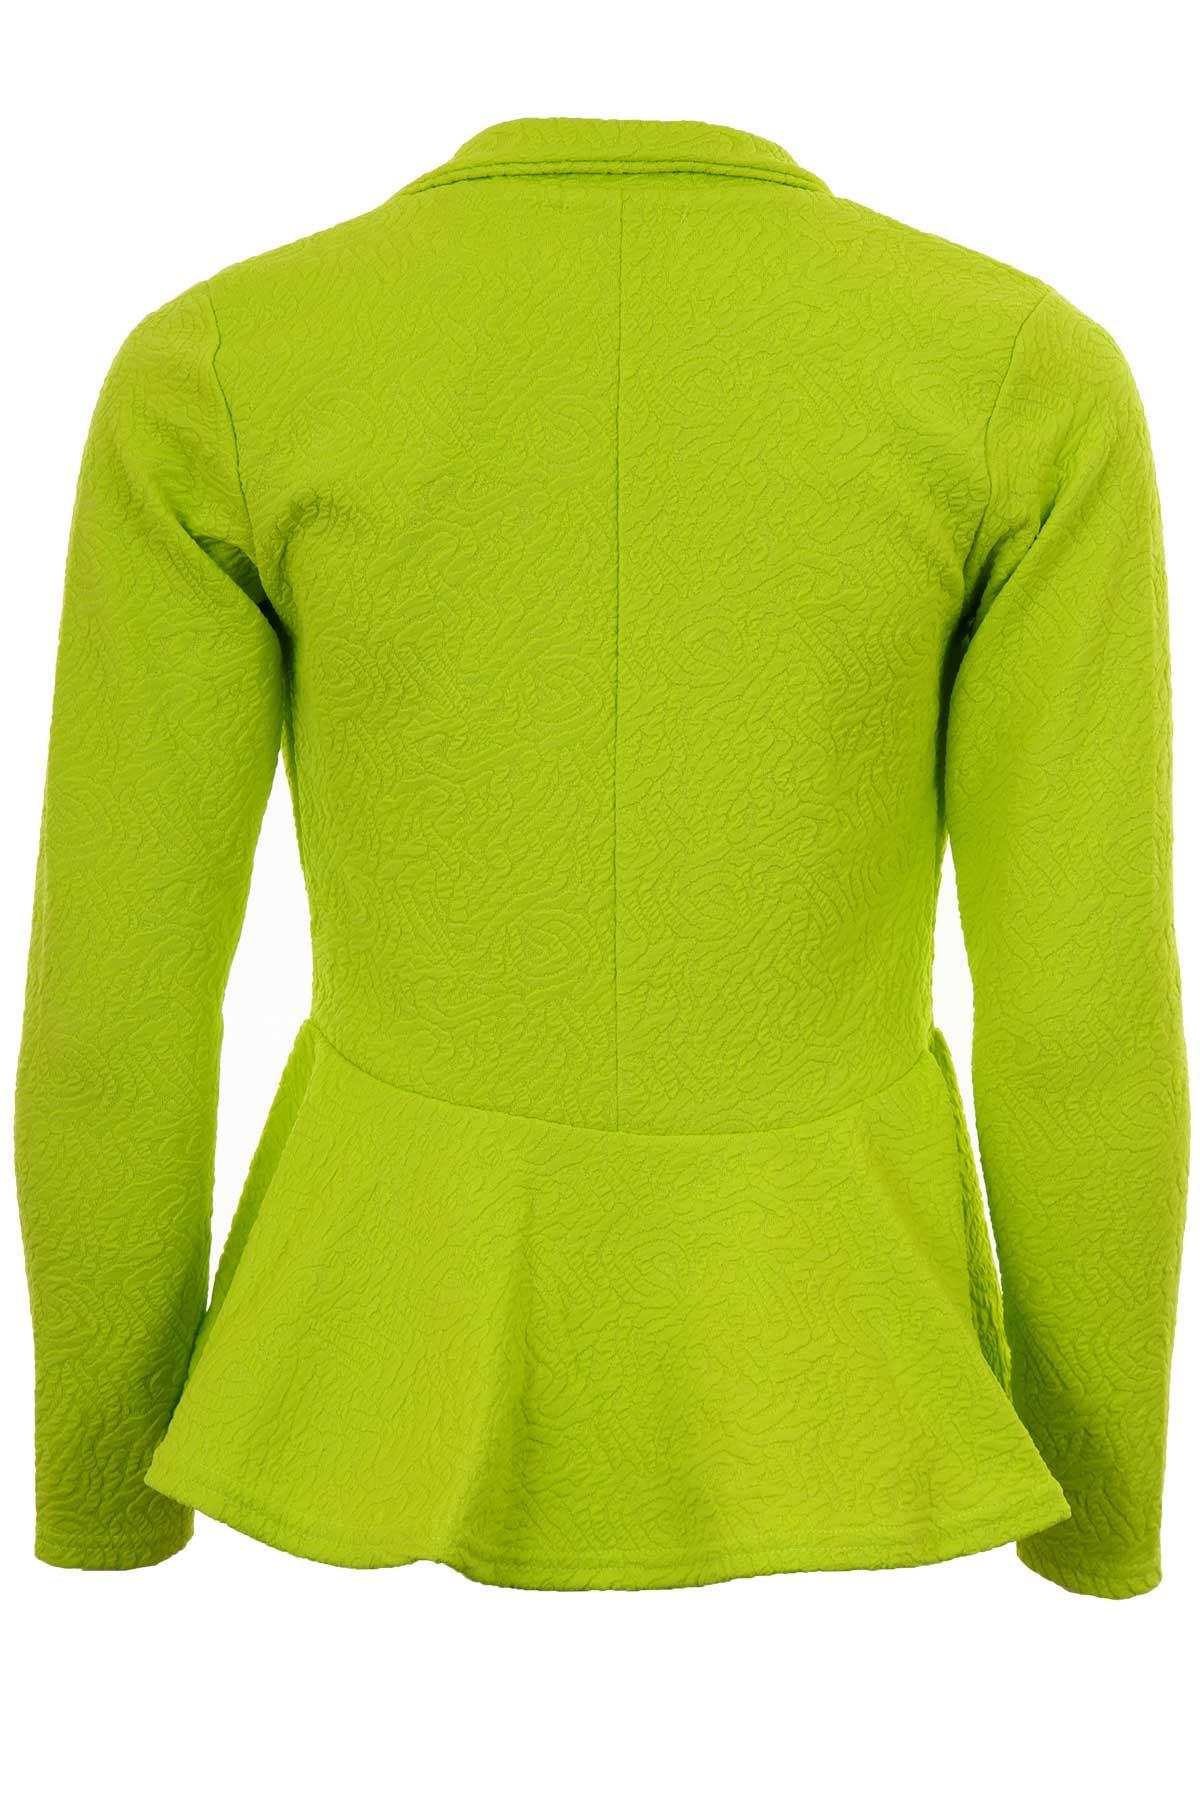 Ladies Textured One Button Luminous Frill Shift Party Blazer Women's Jacket